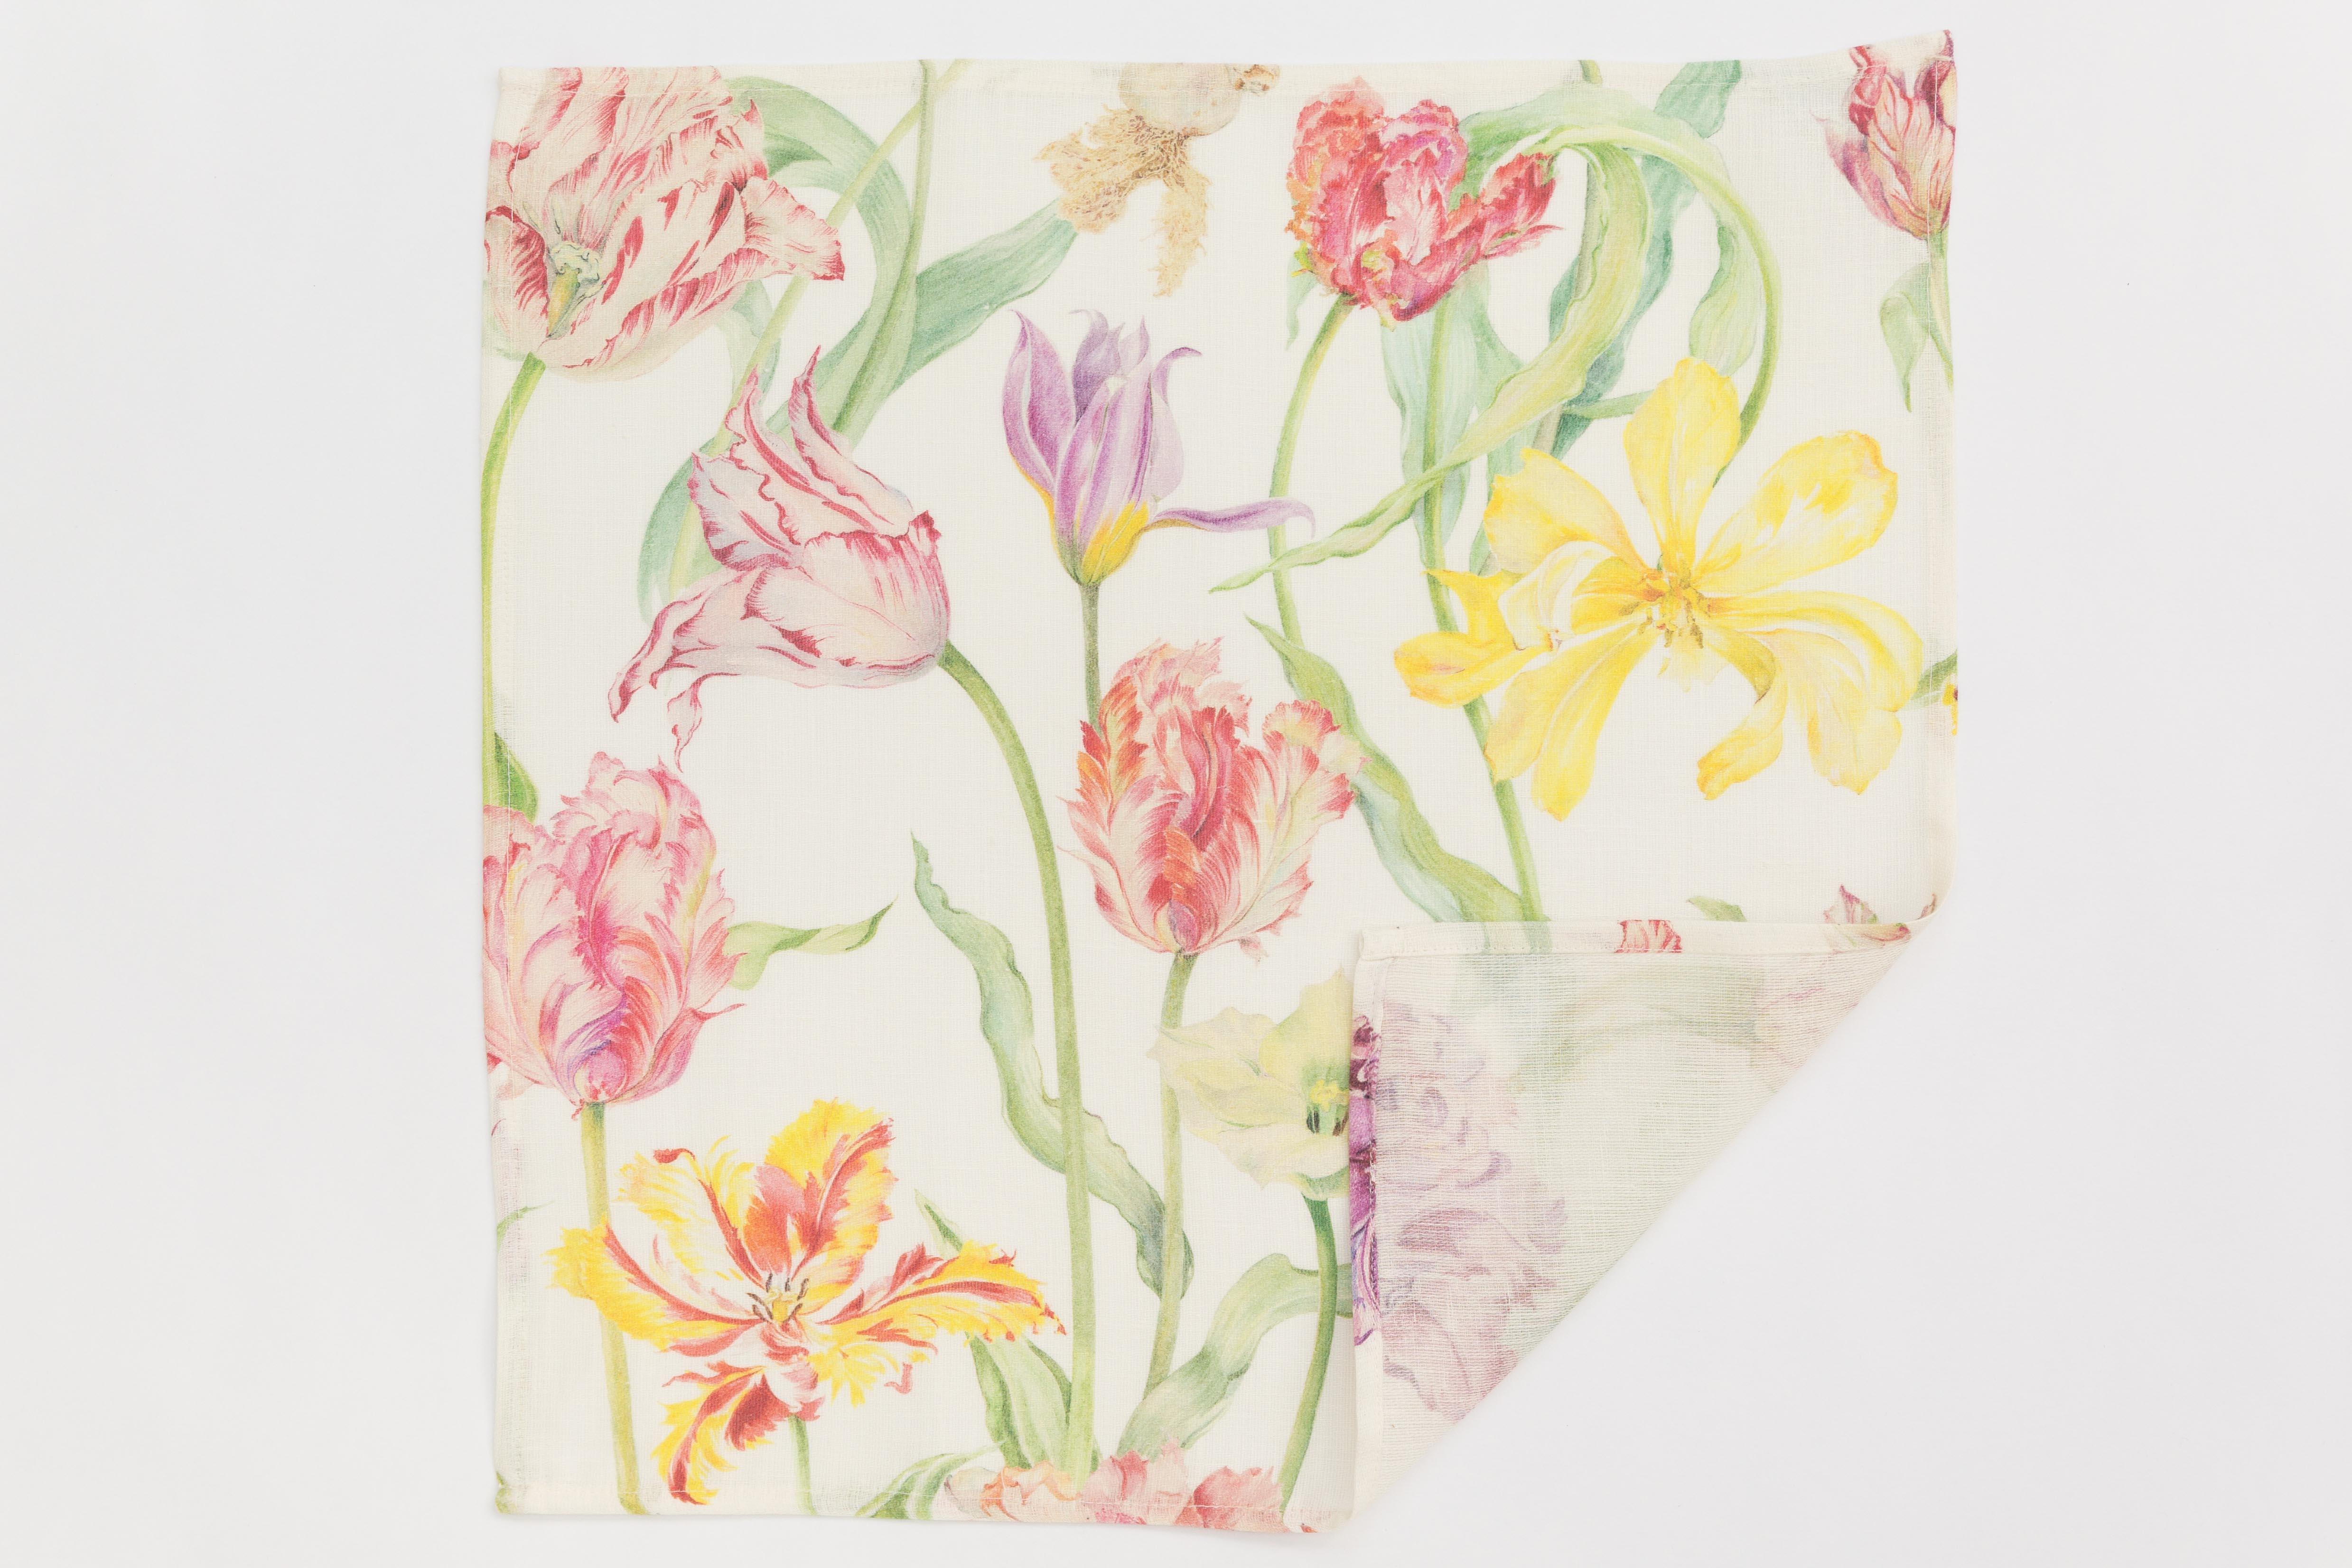 Printed tulipfield  linen napkin/guest towel